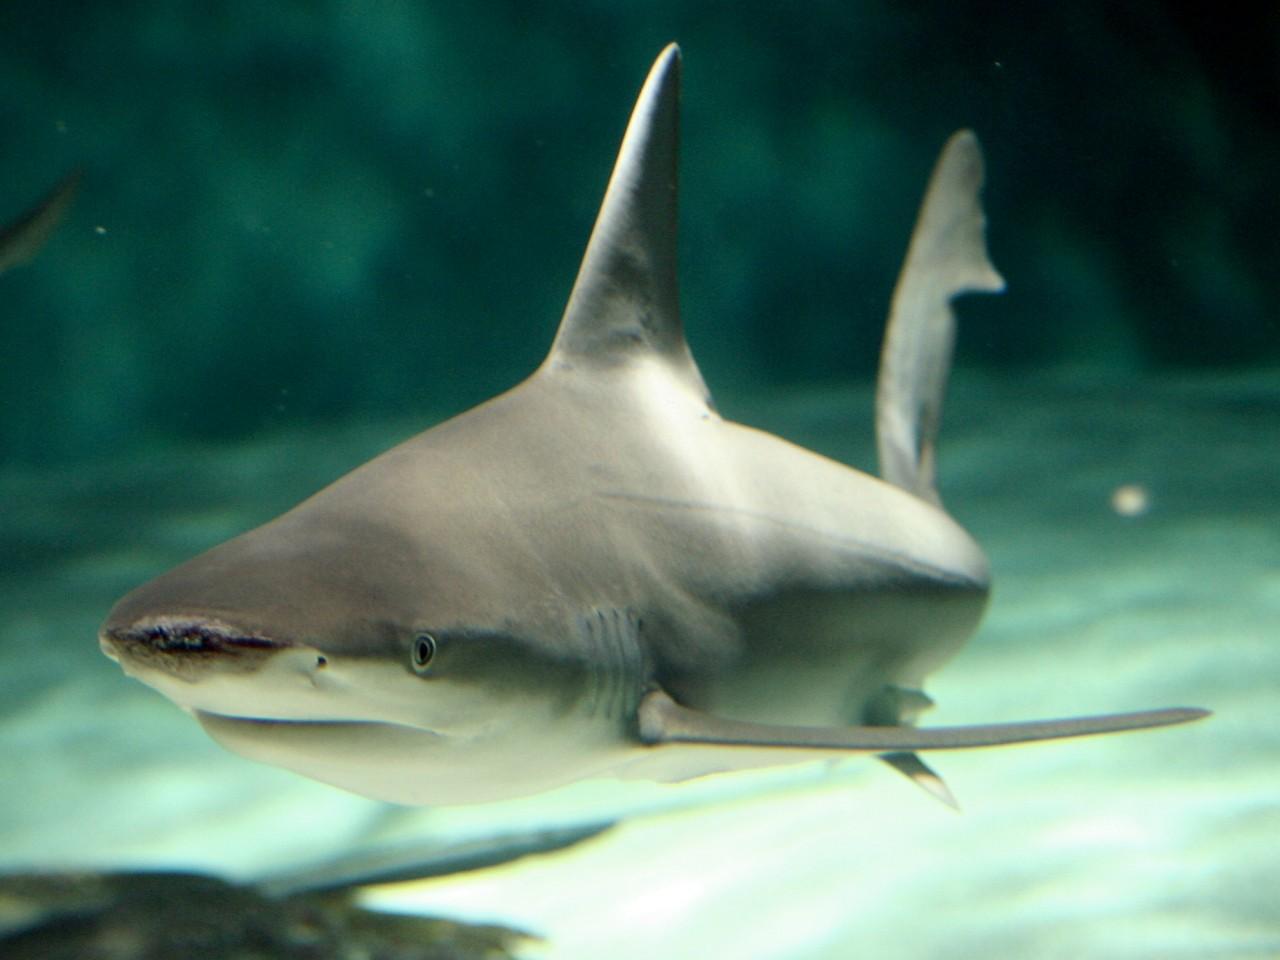 China bans shark fin soup at official dinners - Salon.com